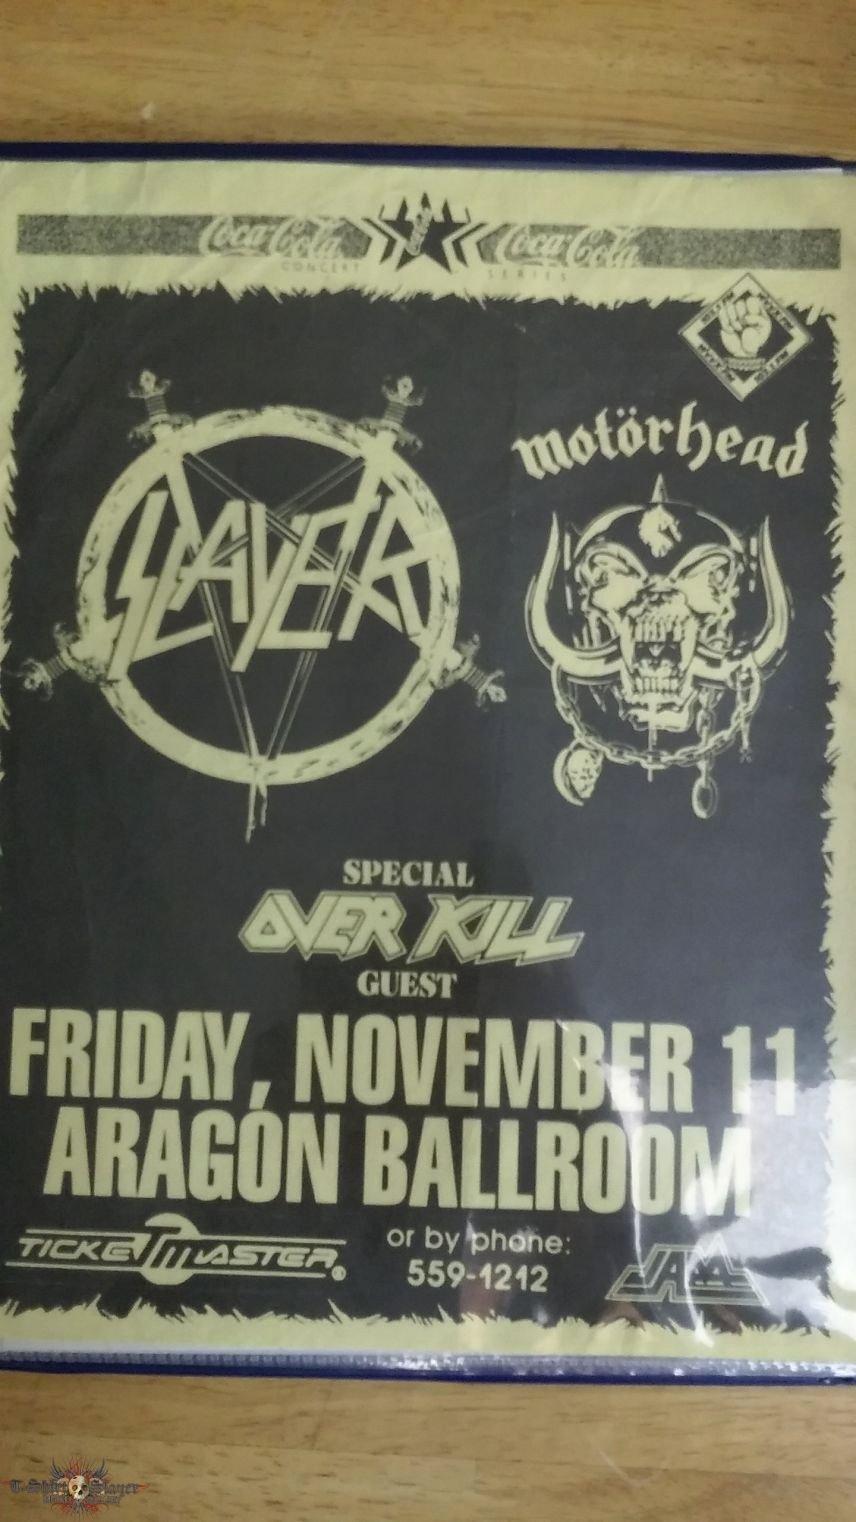 T Shirt Sale Flyer Elegant Slayer Motorhead Overkill tour Flyer